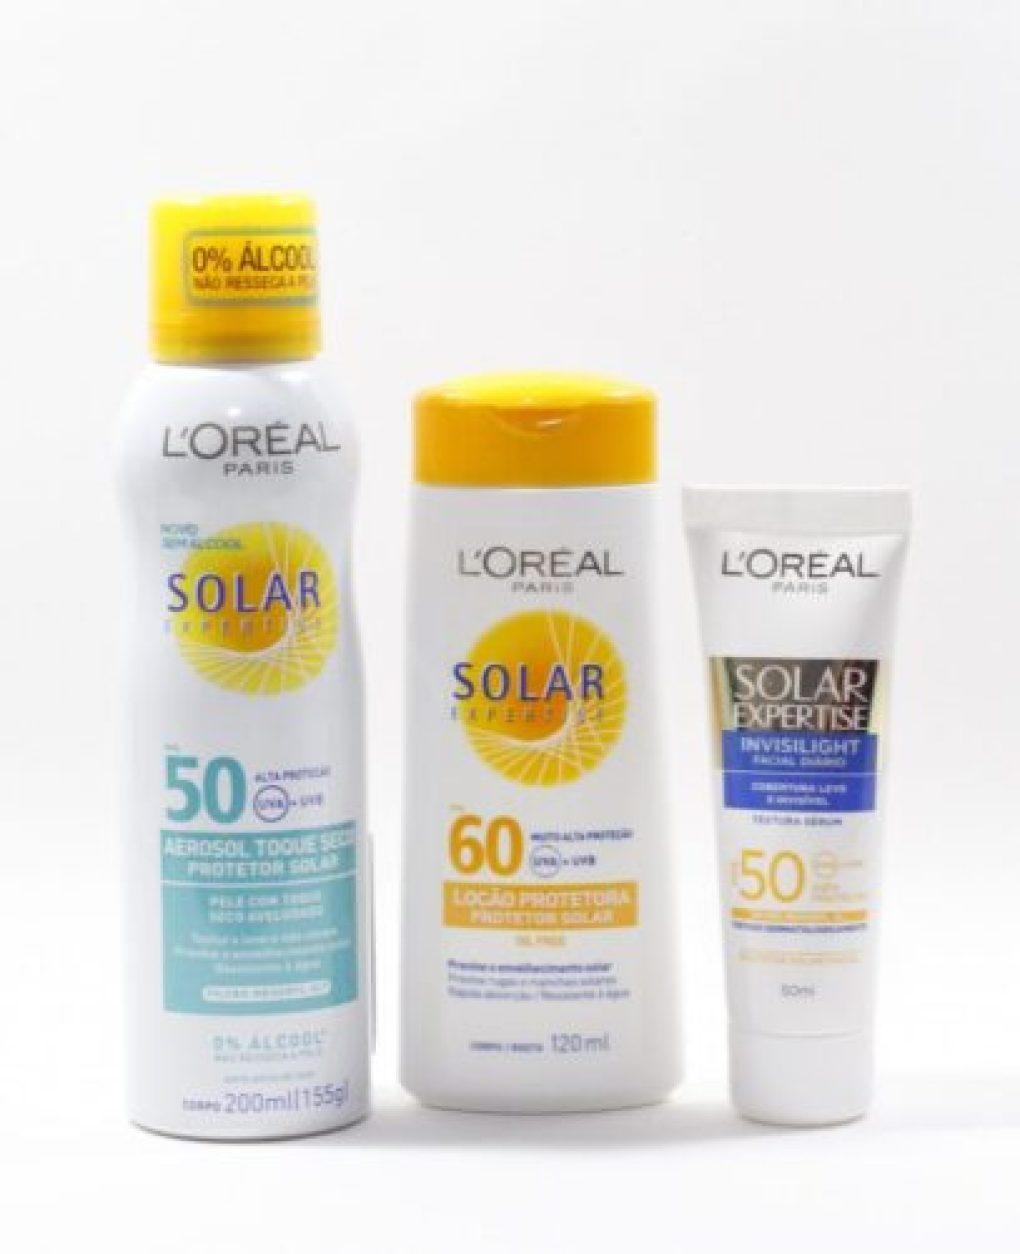 Resenha: Protetores Solar Expertise da L'Oréal Paris